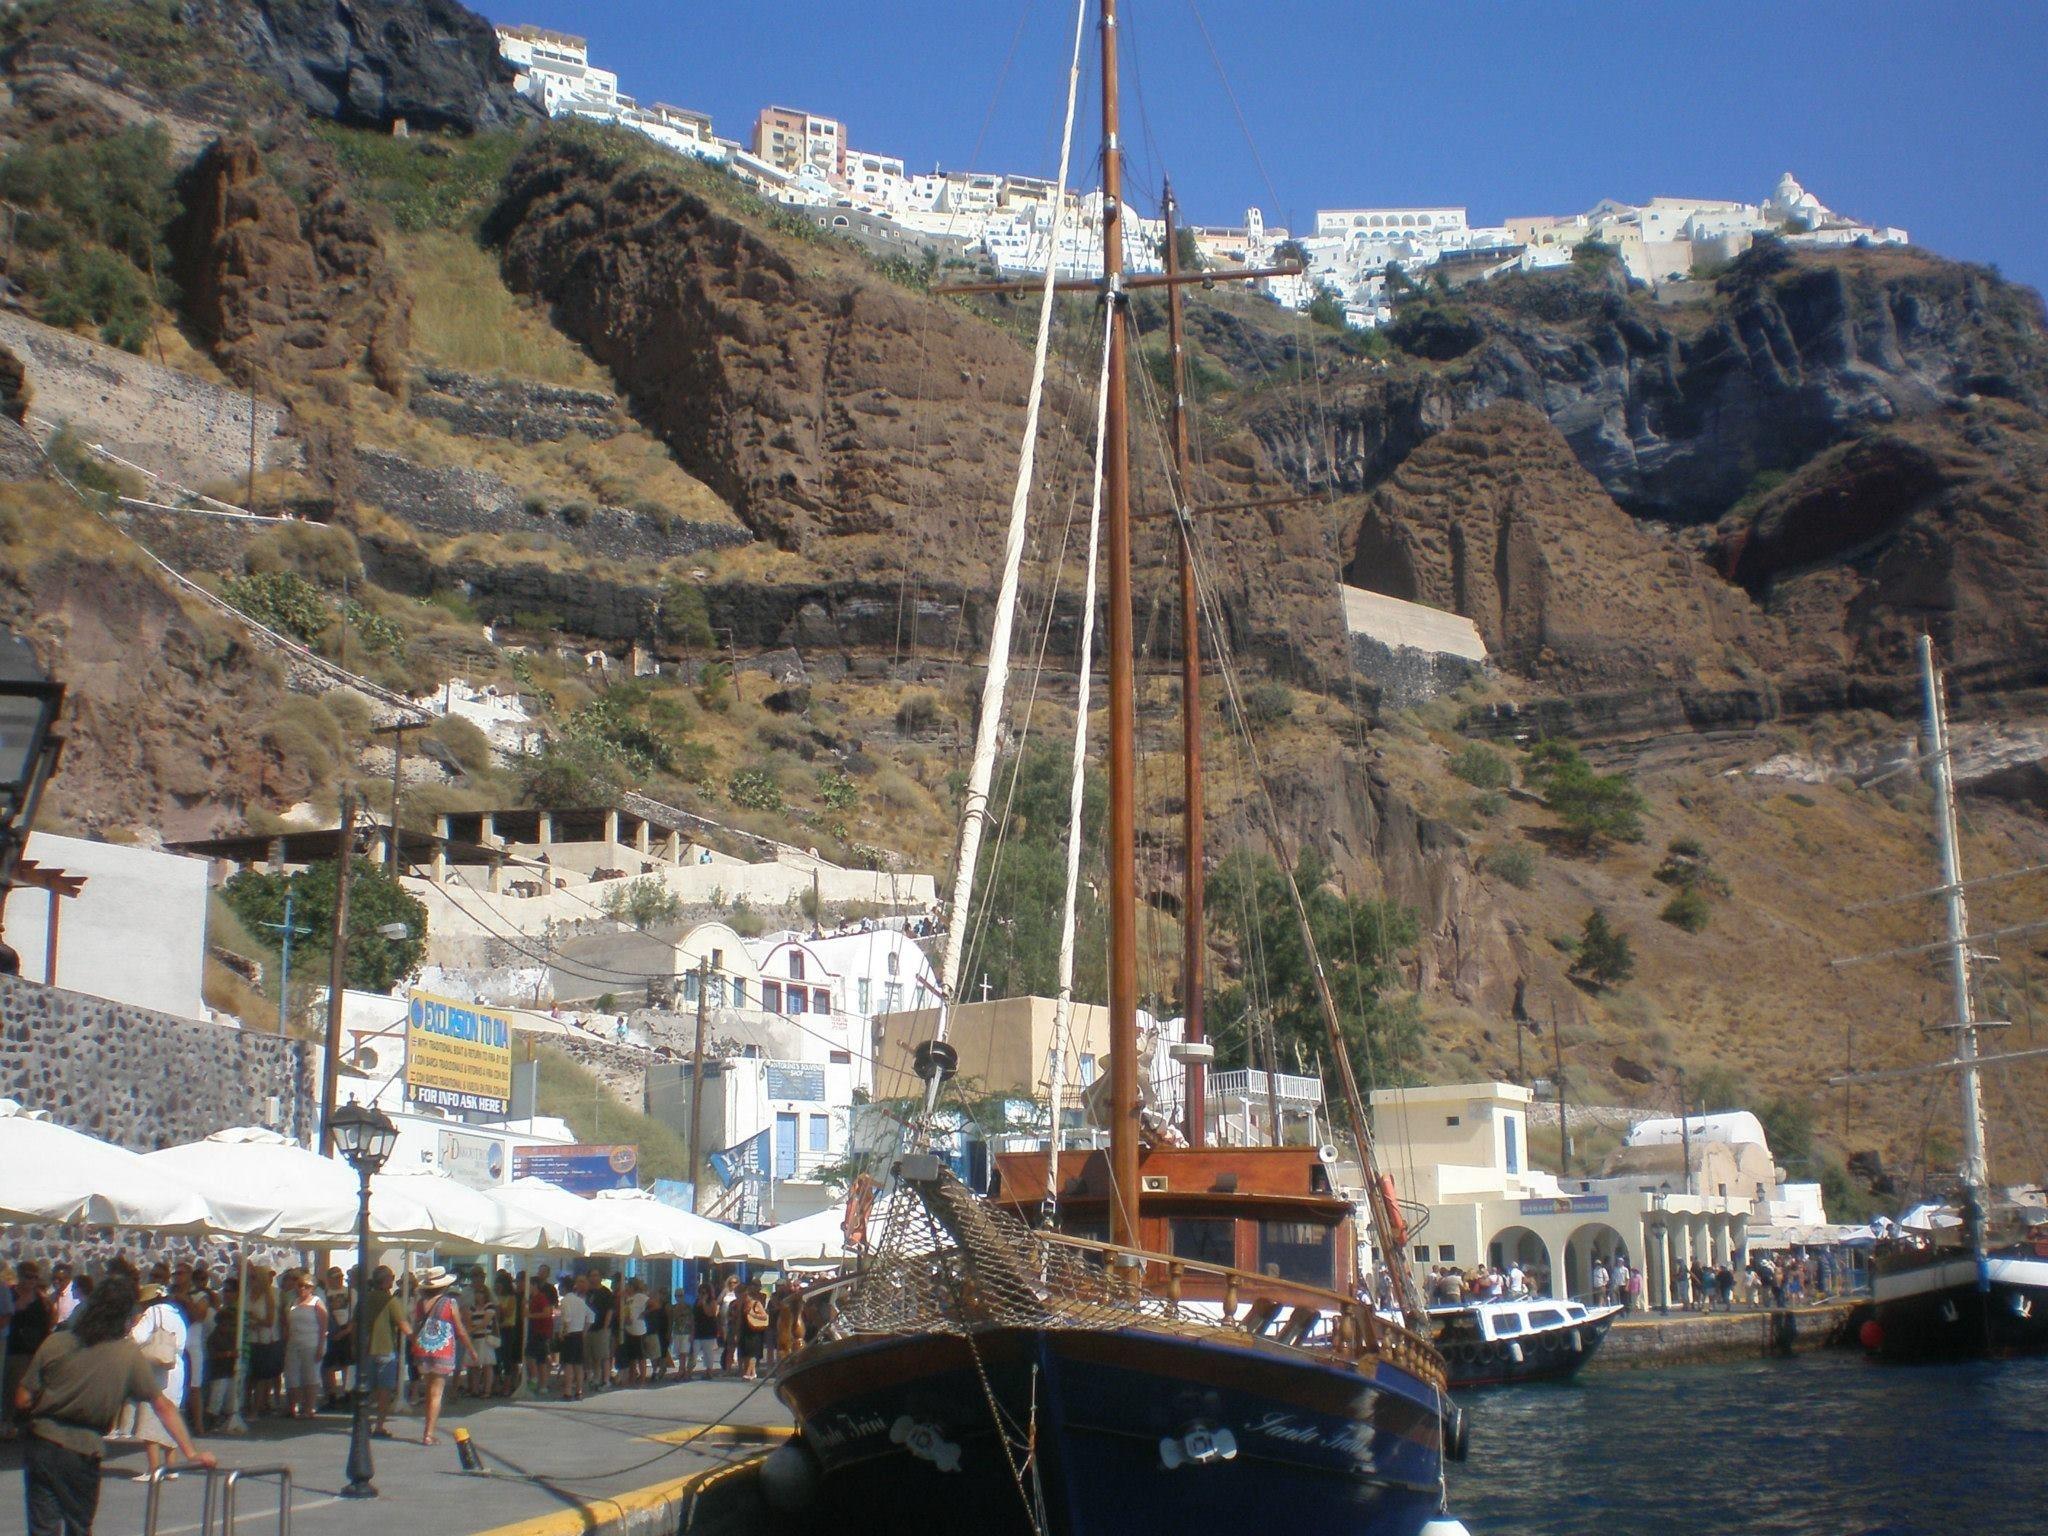 Les ports de Santorin